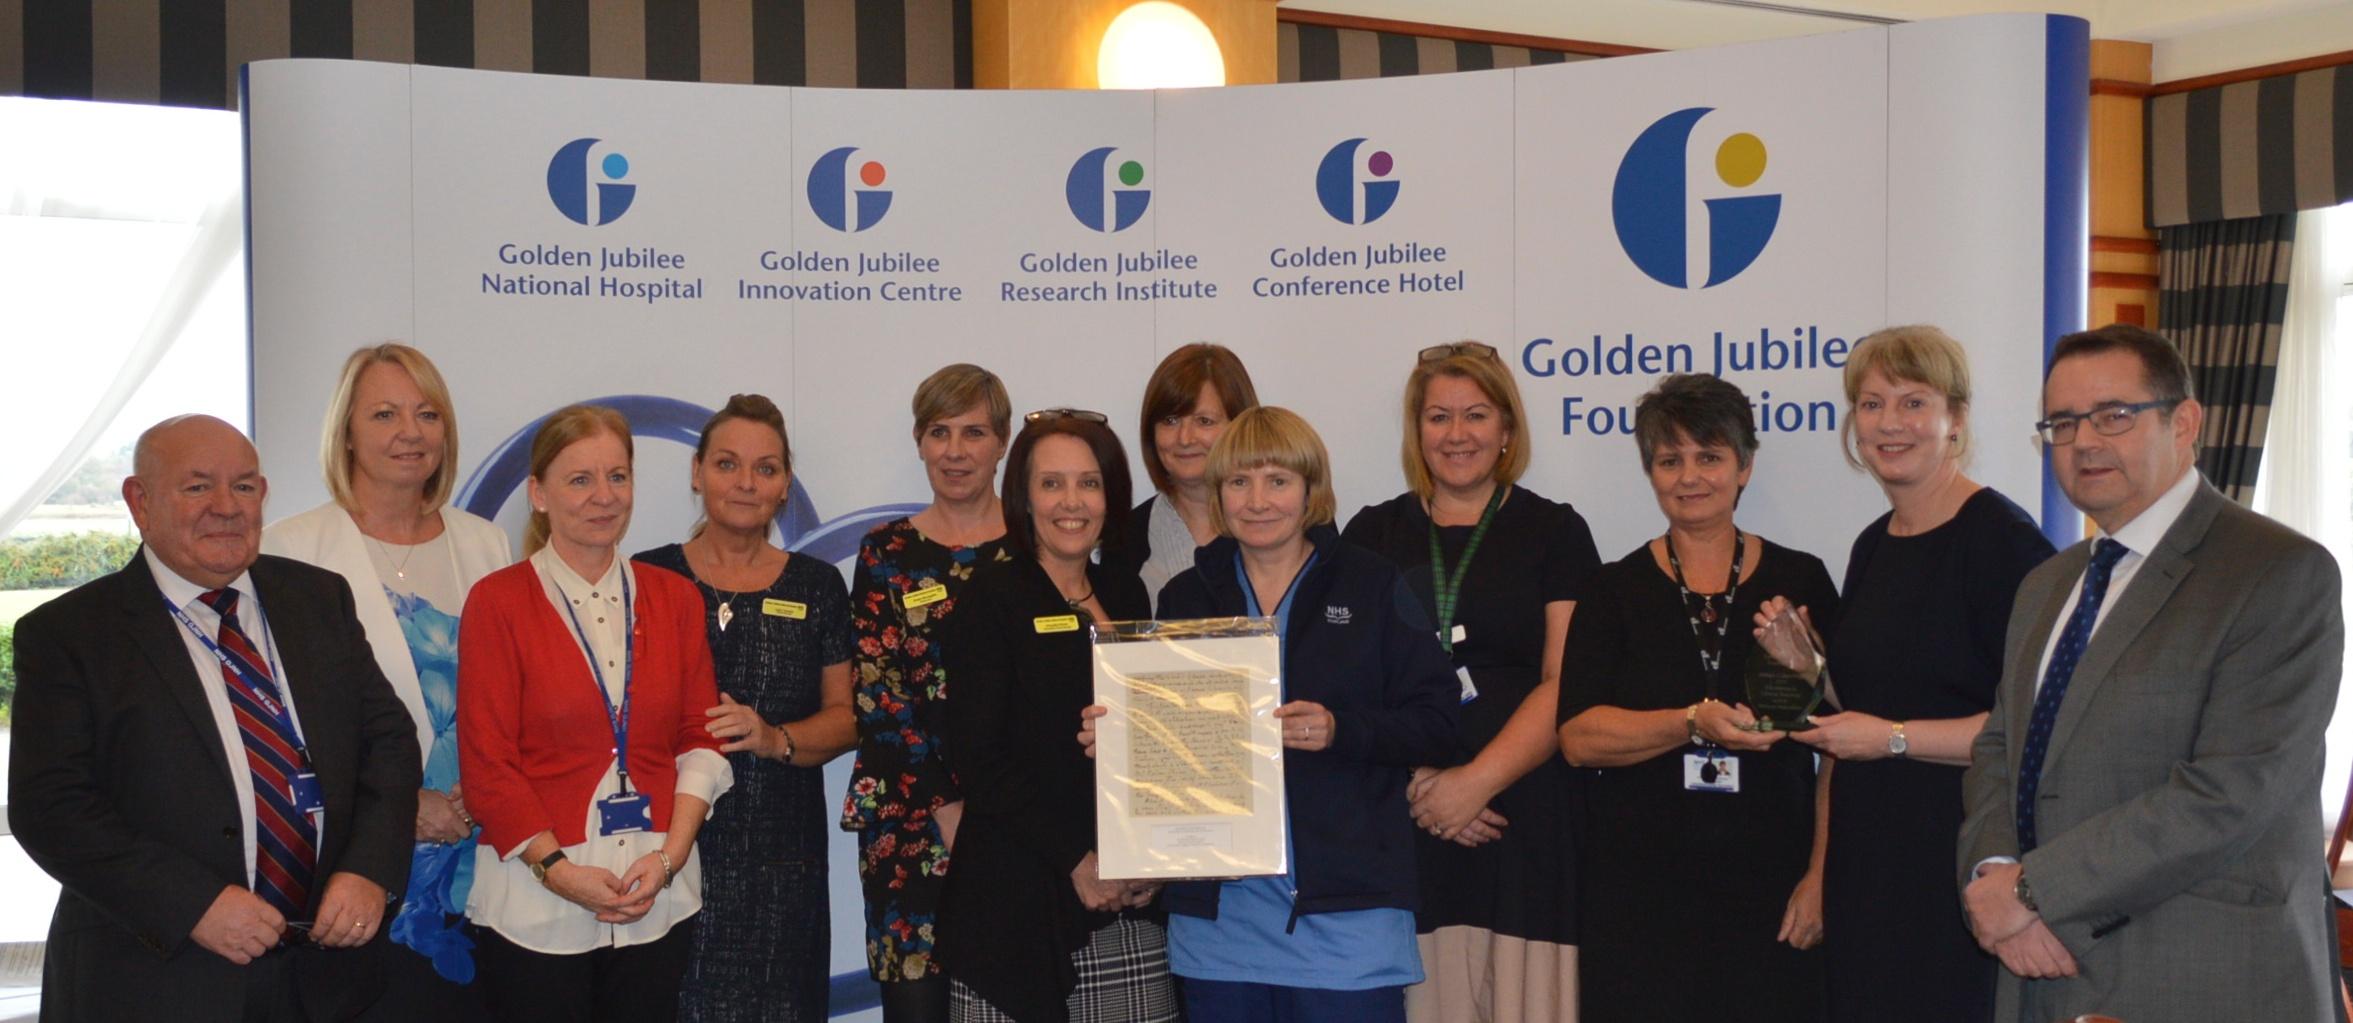 William Cullen Prize Golden Jubilee